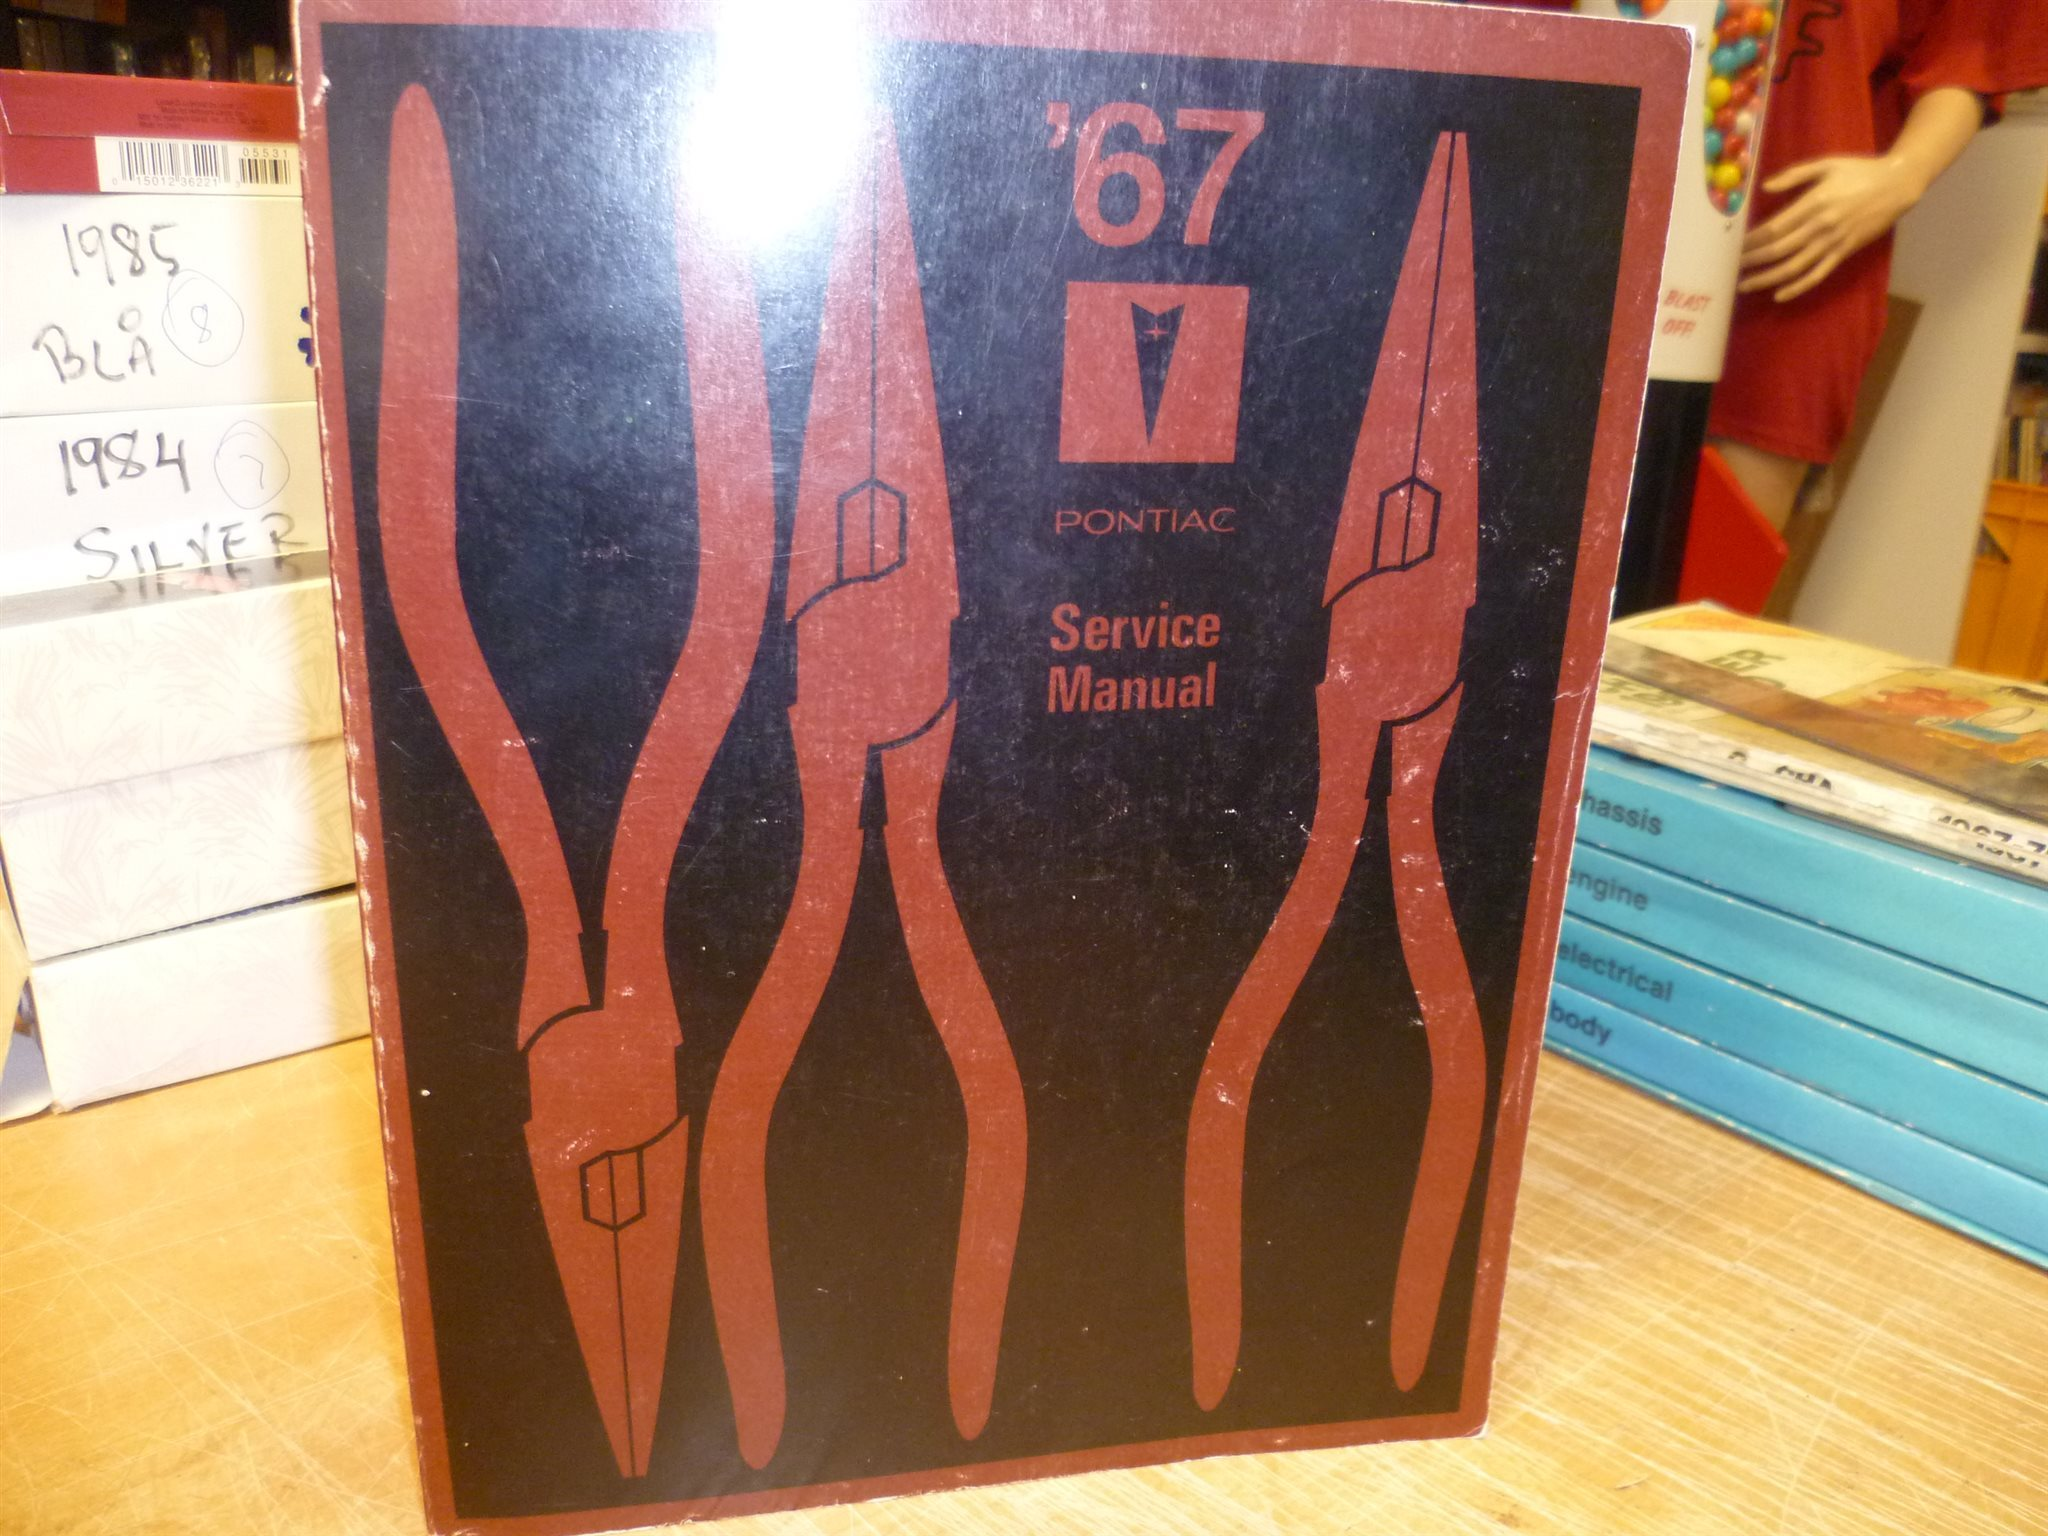 1967 PONTIAC , Chassis Service Manual , Verkstadshandbok , REPRO!!!!!